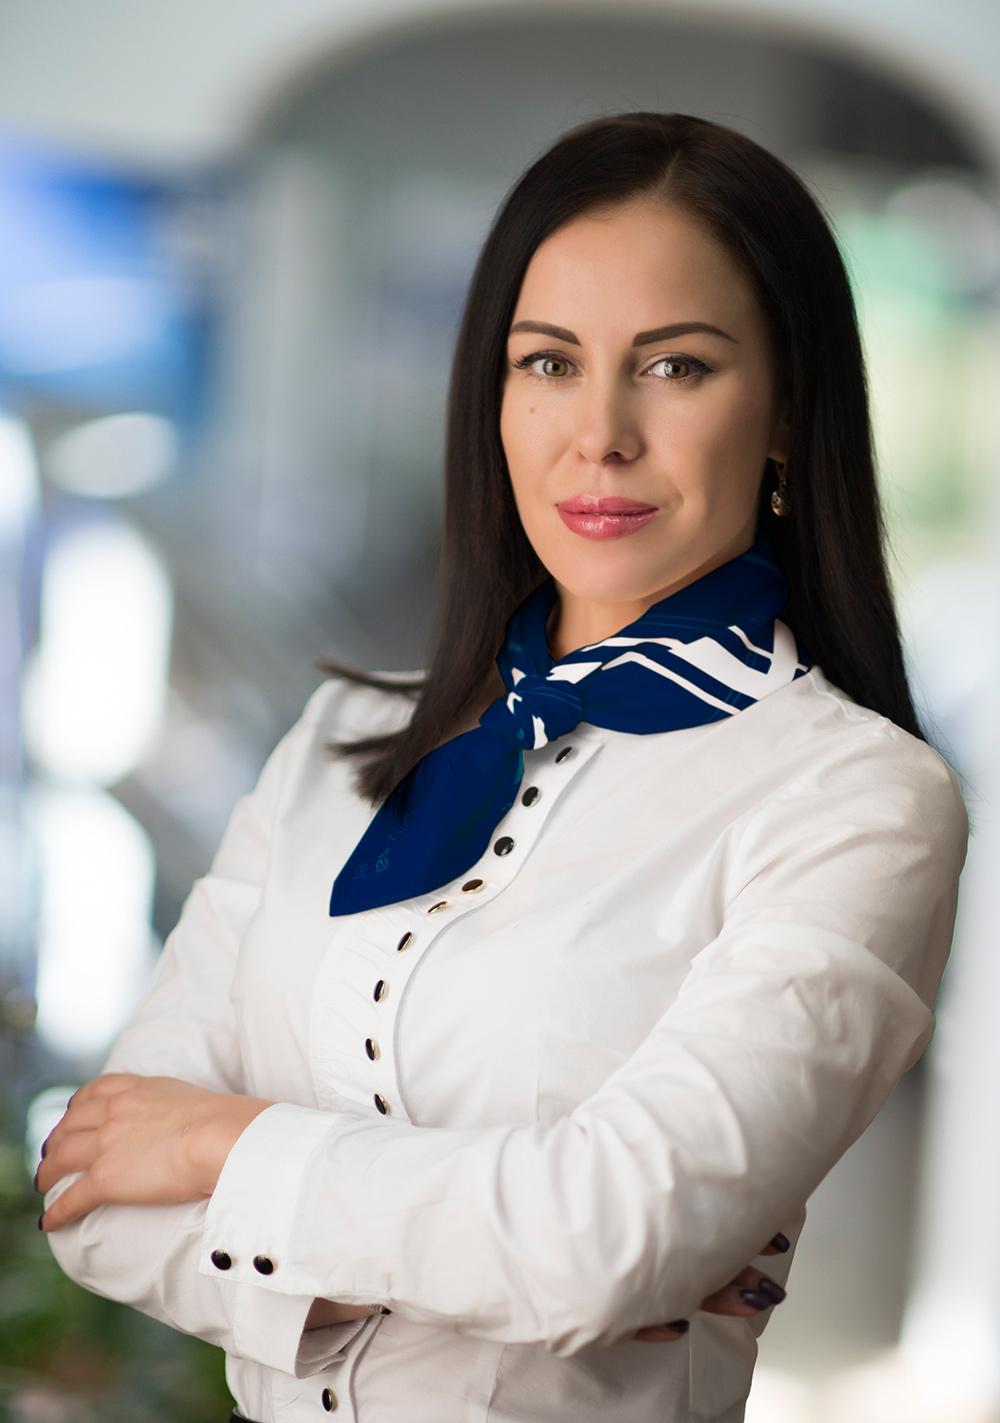 Olga Plis